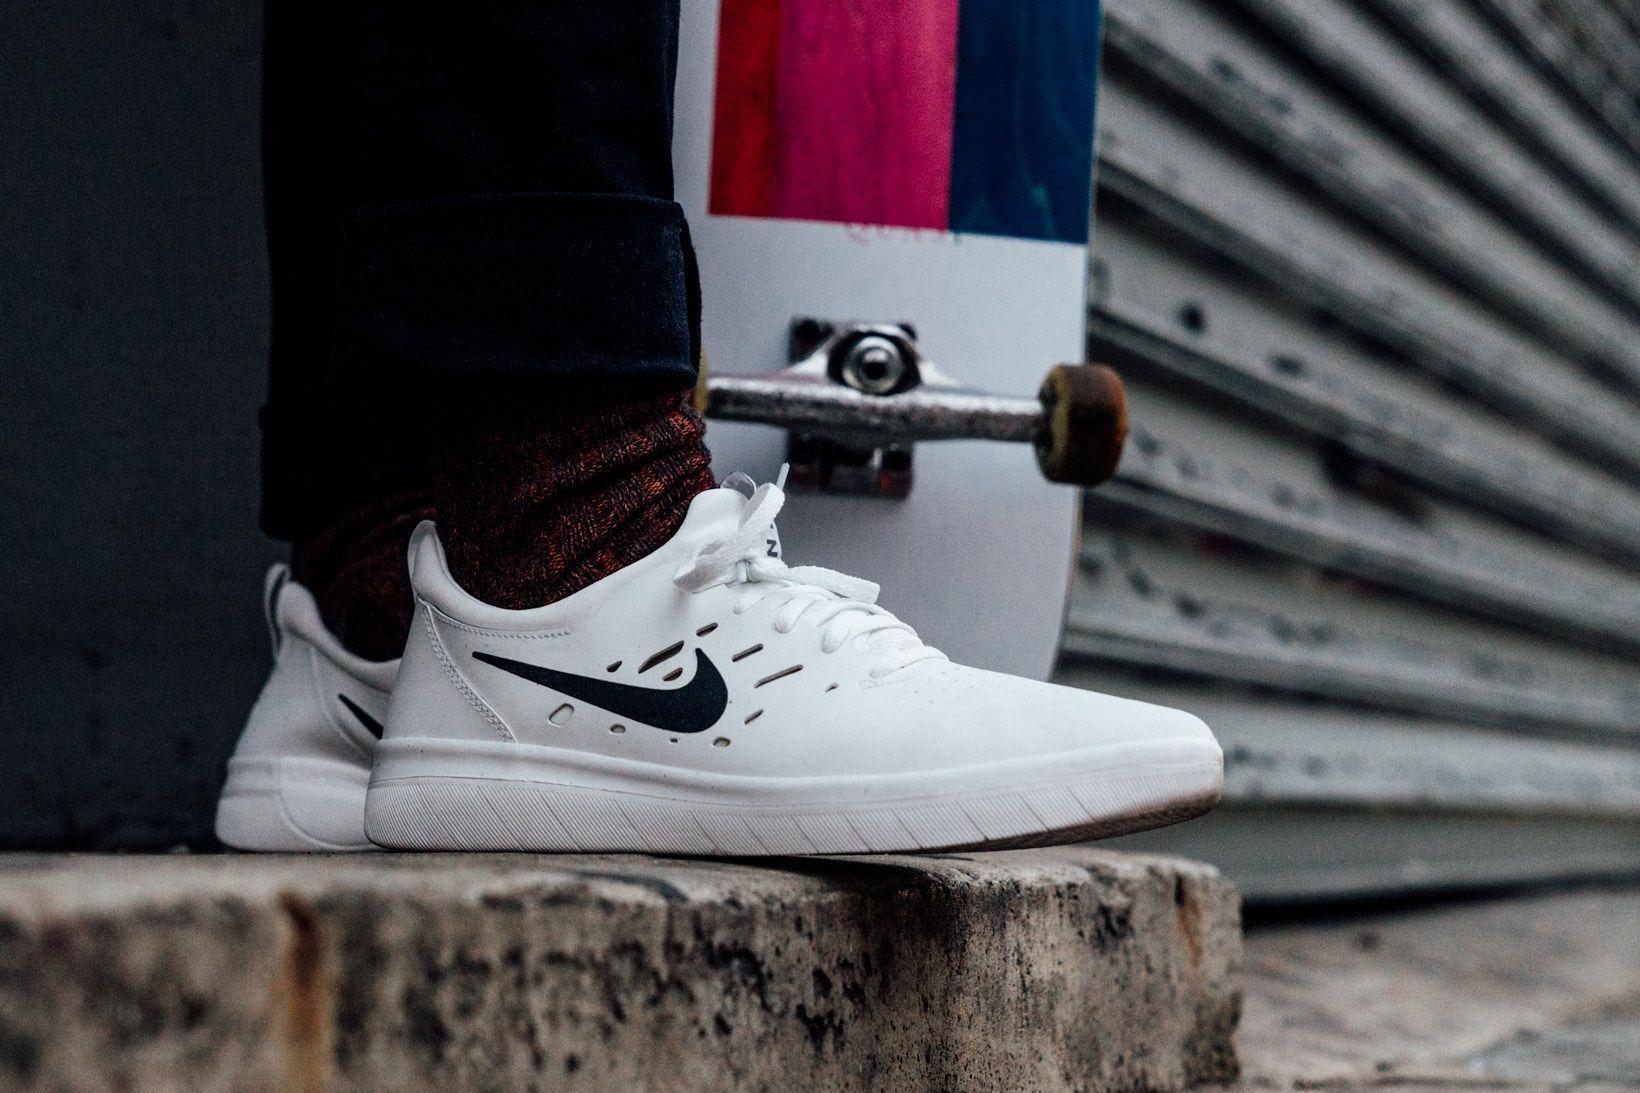 Nyjah Huston Nike SB Nyjah Free Sneakers Skateboarding Closer Look Release  Date Info Drops March 1 2018 759c0e4e0